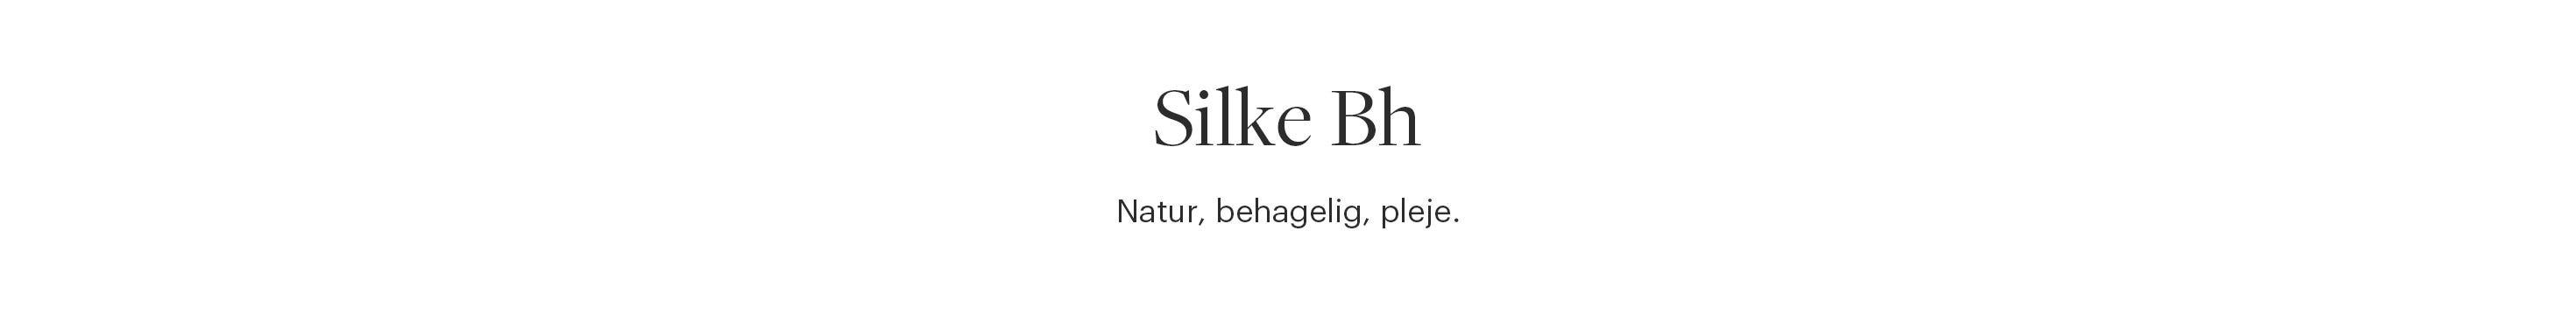 Silke Bh